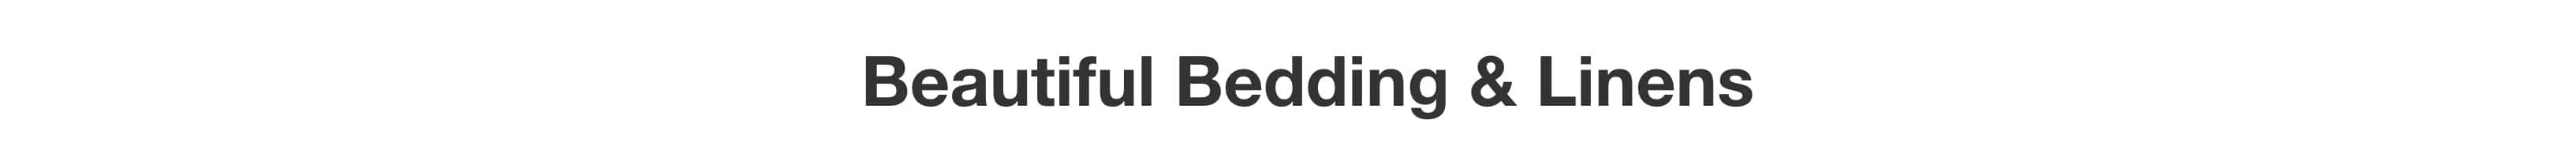 Beautiful Bedding & Linens